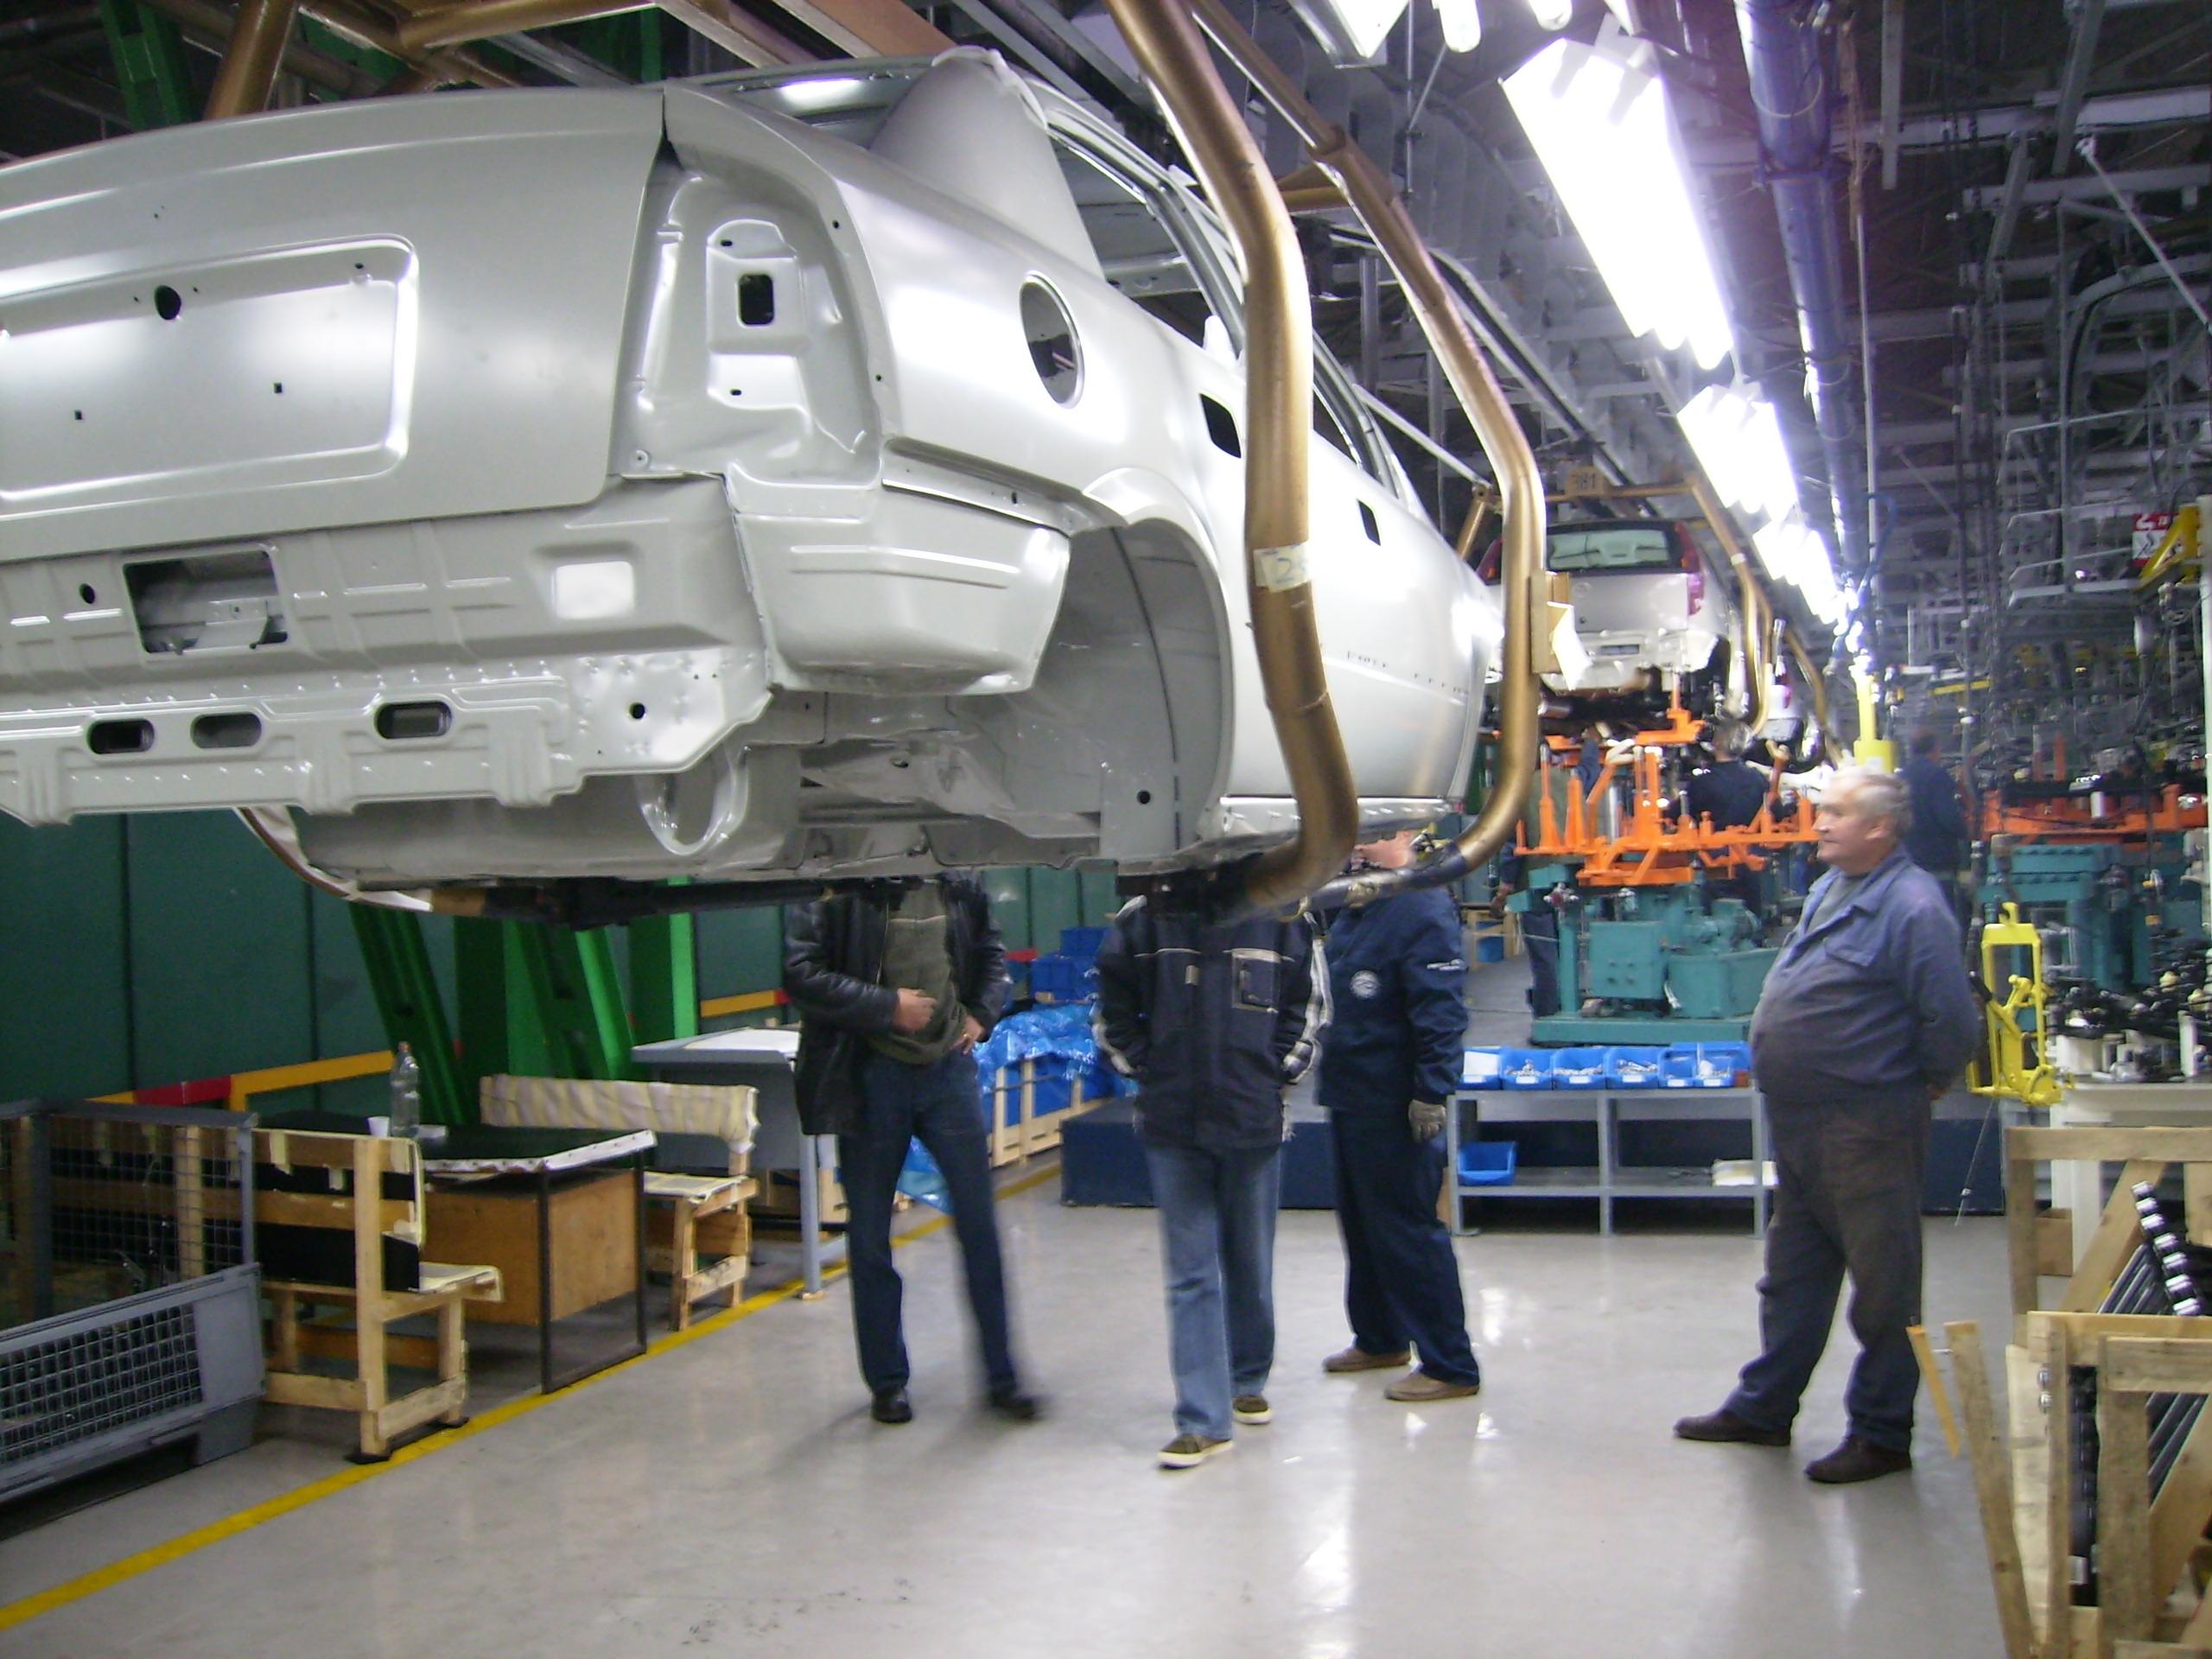 Opel Astra iz Kragujevca – neostvarena želja, lekcija za budućnost